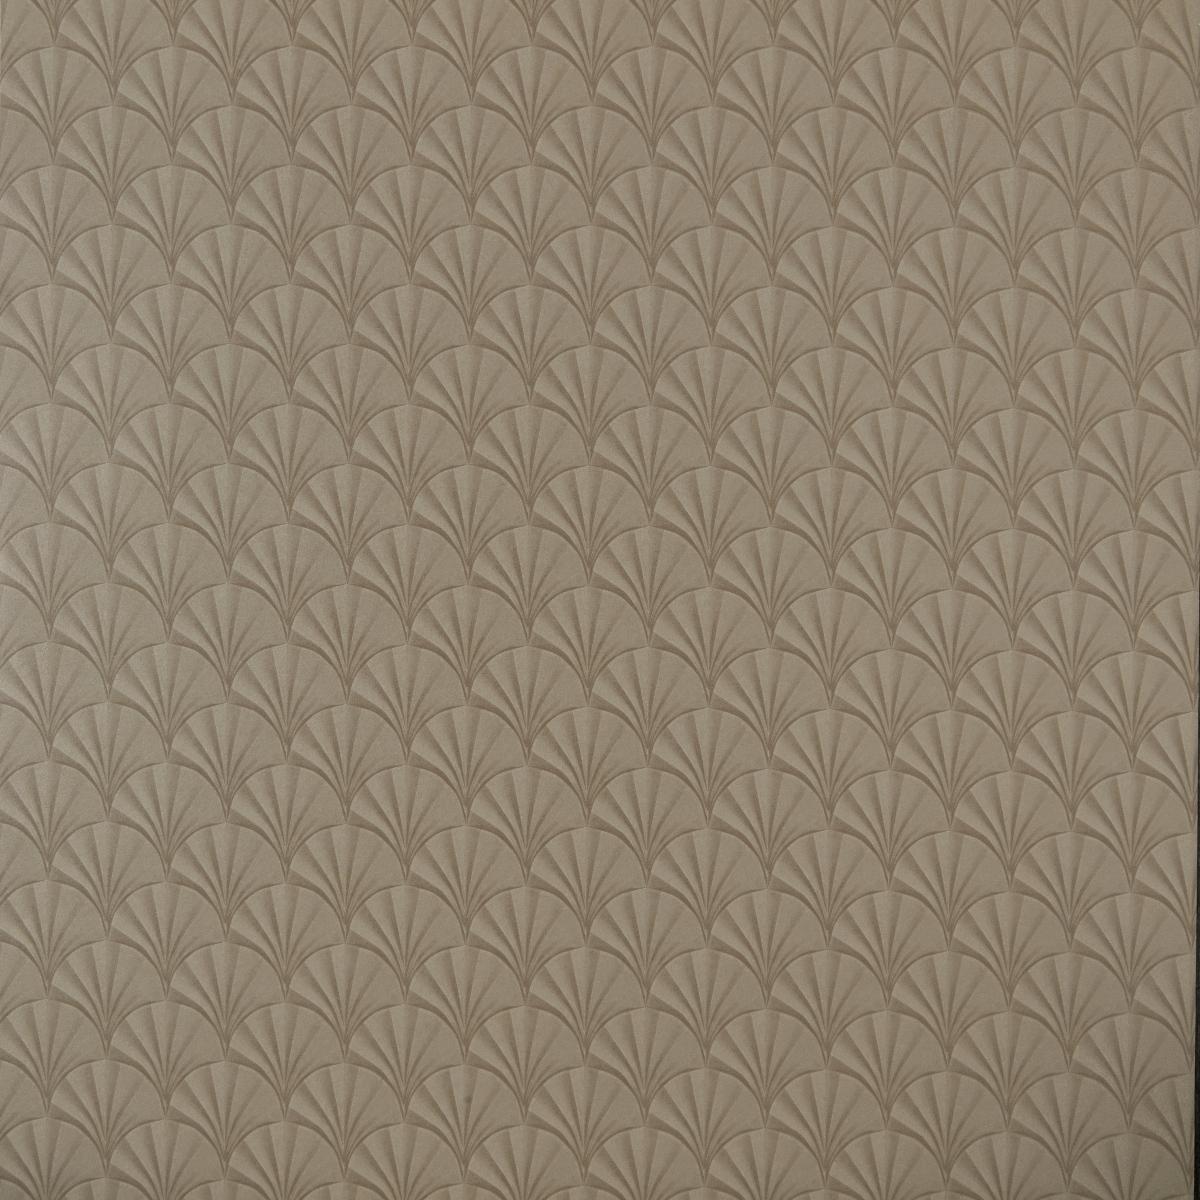 Tapet art deco, Elodie, 1838 Wallcoverings, 5.3mp / rola